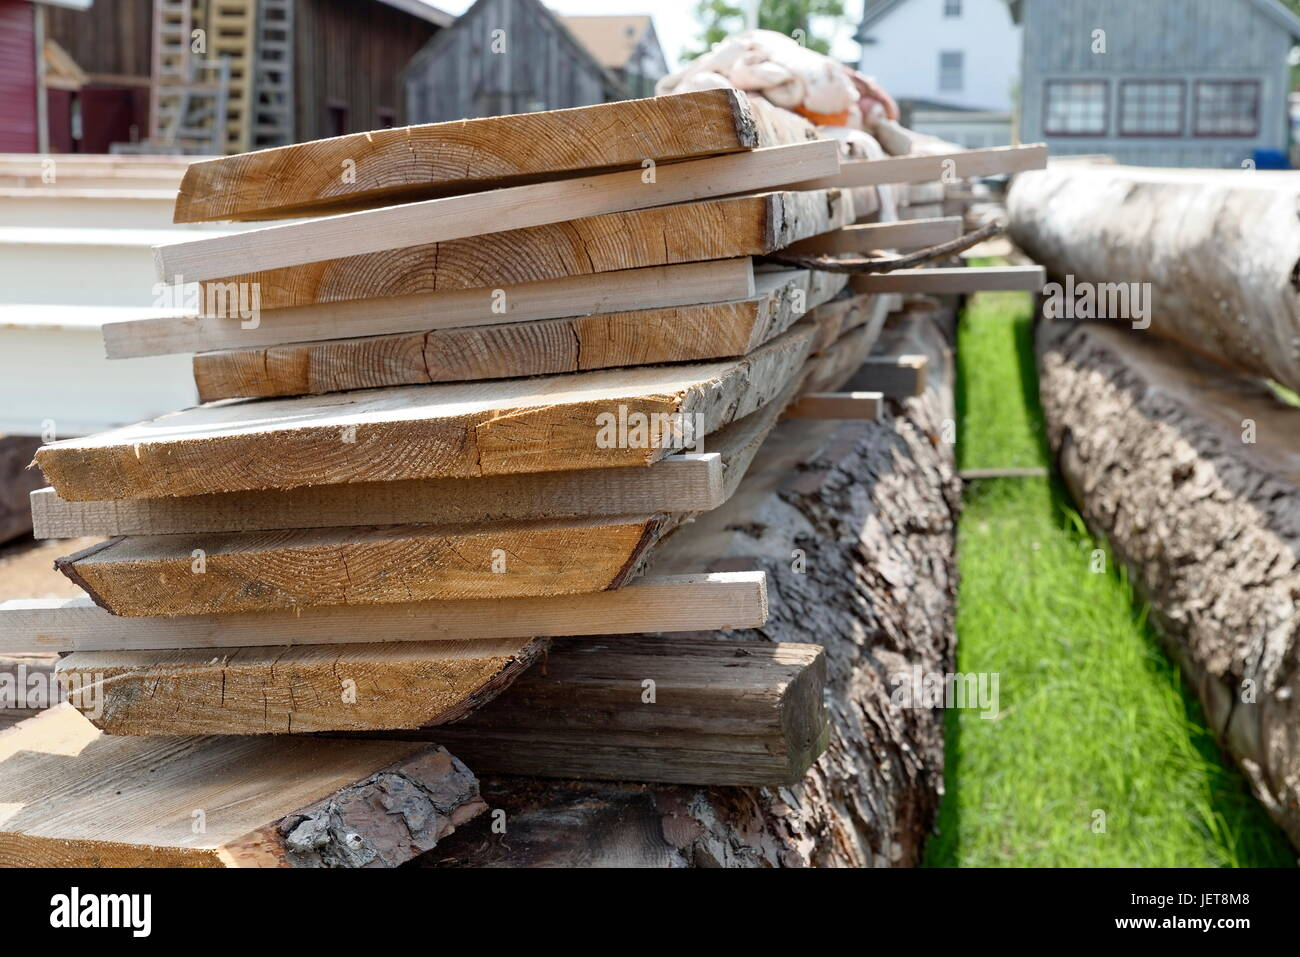 Shipbuilder's Wood Planks - Stock Image